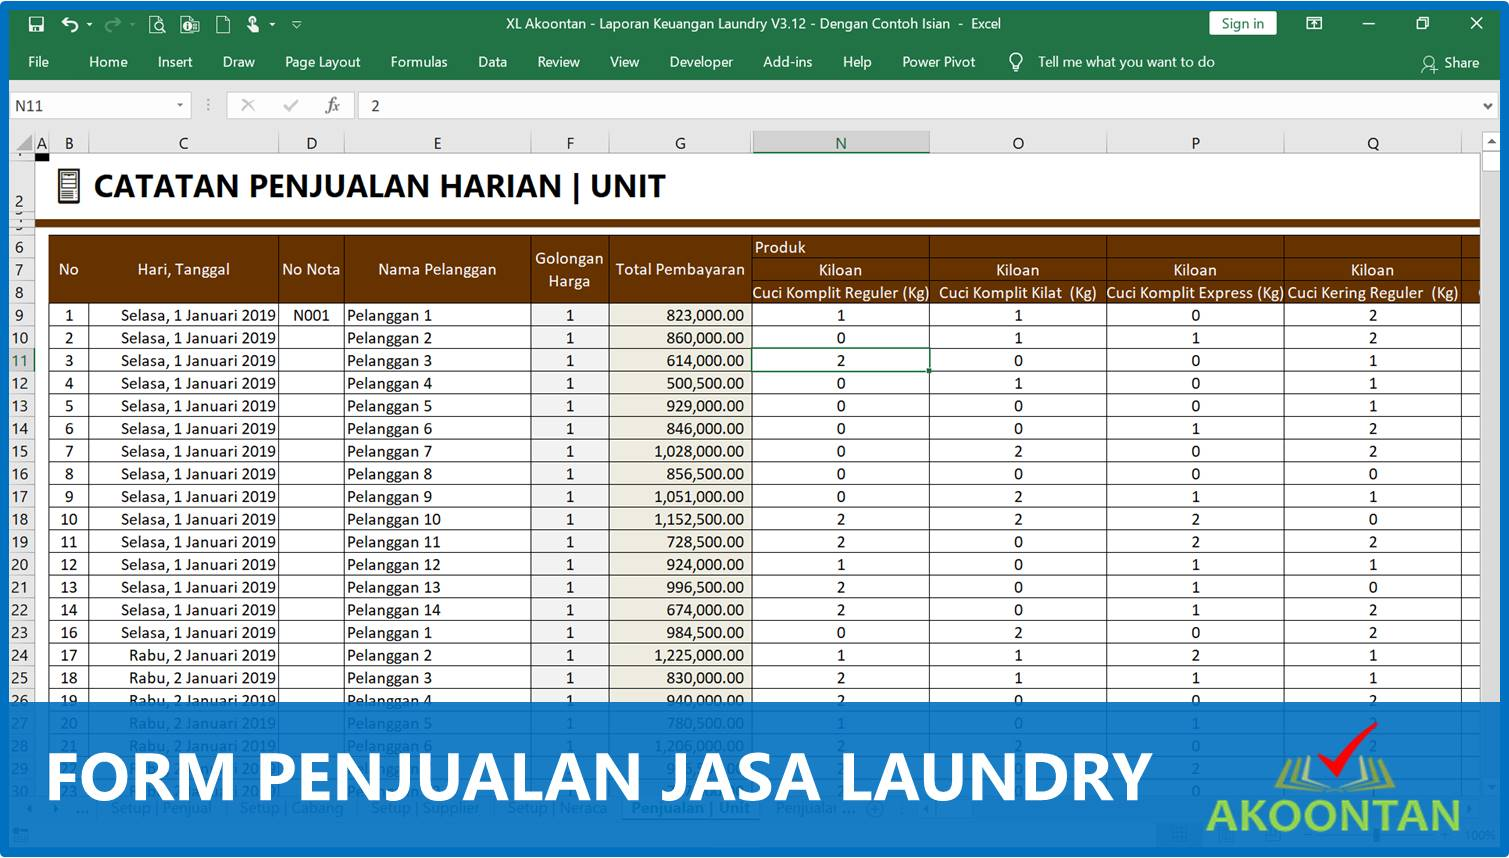 Akuntansi-ID - Form Penjualan Laundry